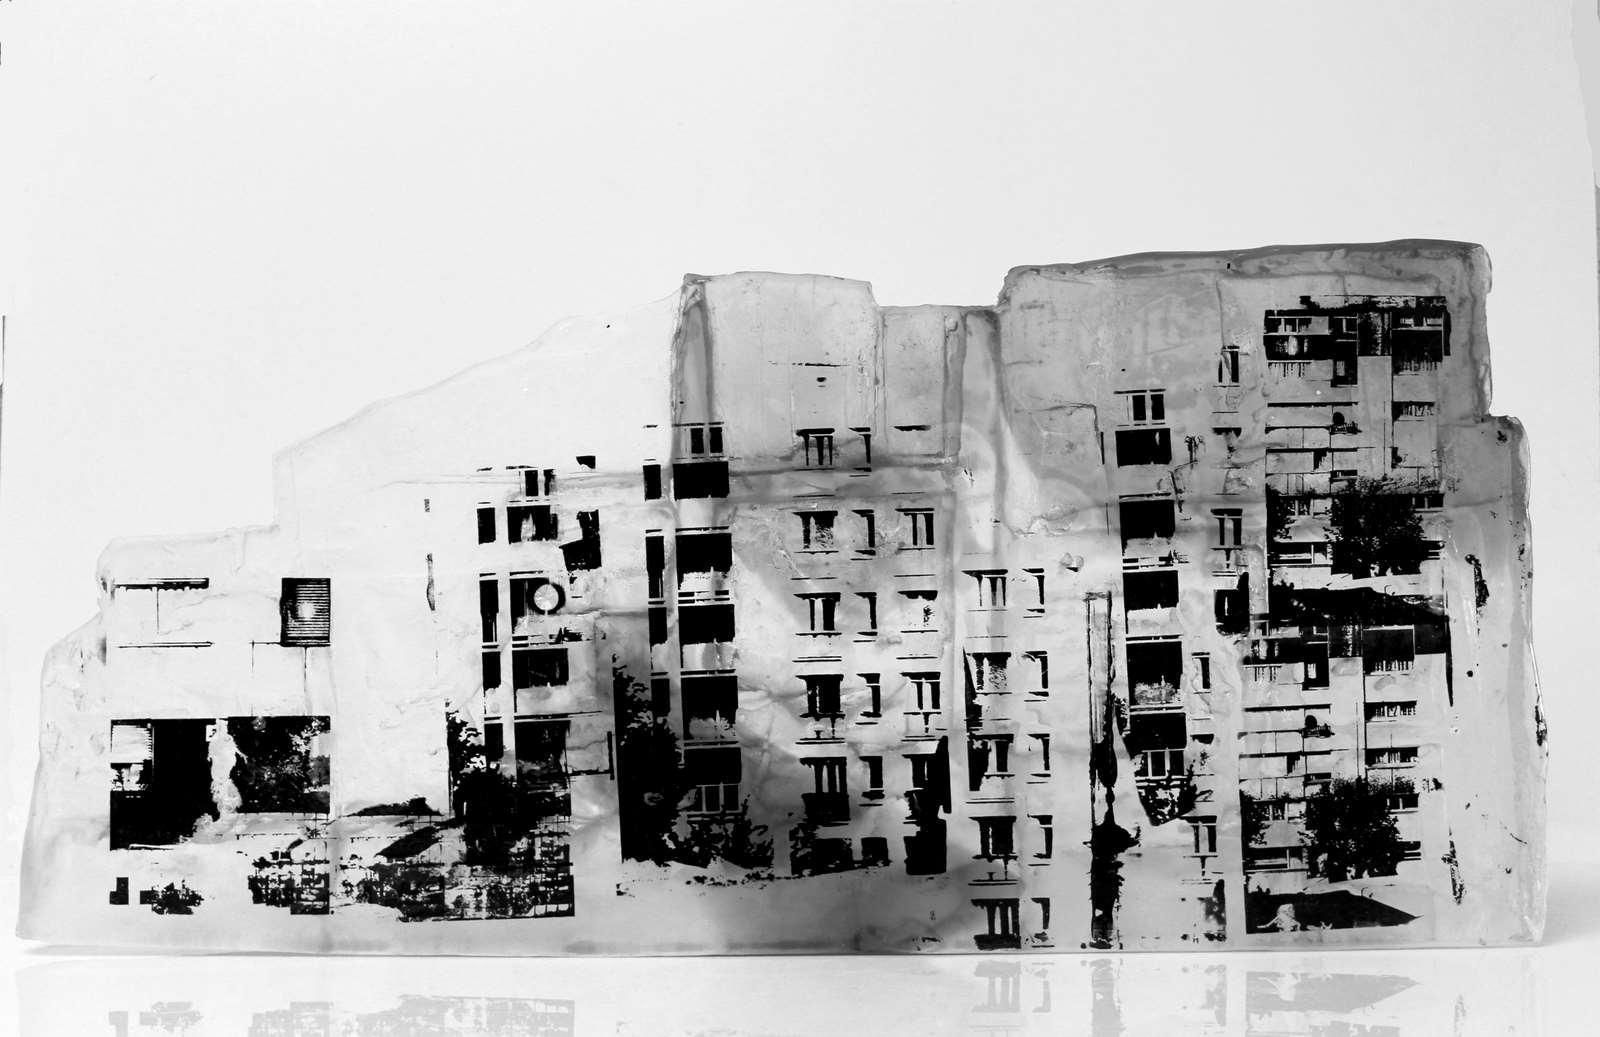 Grande façade, pâte de verre, verre gris et incolore, sérigraphie, 2019